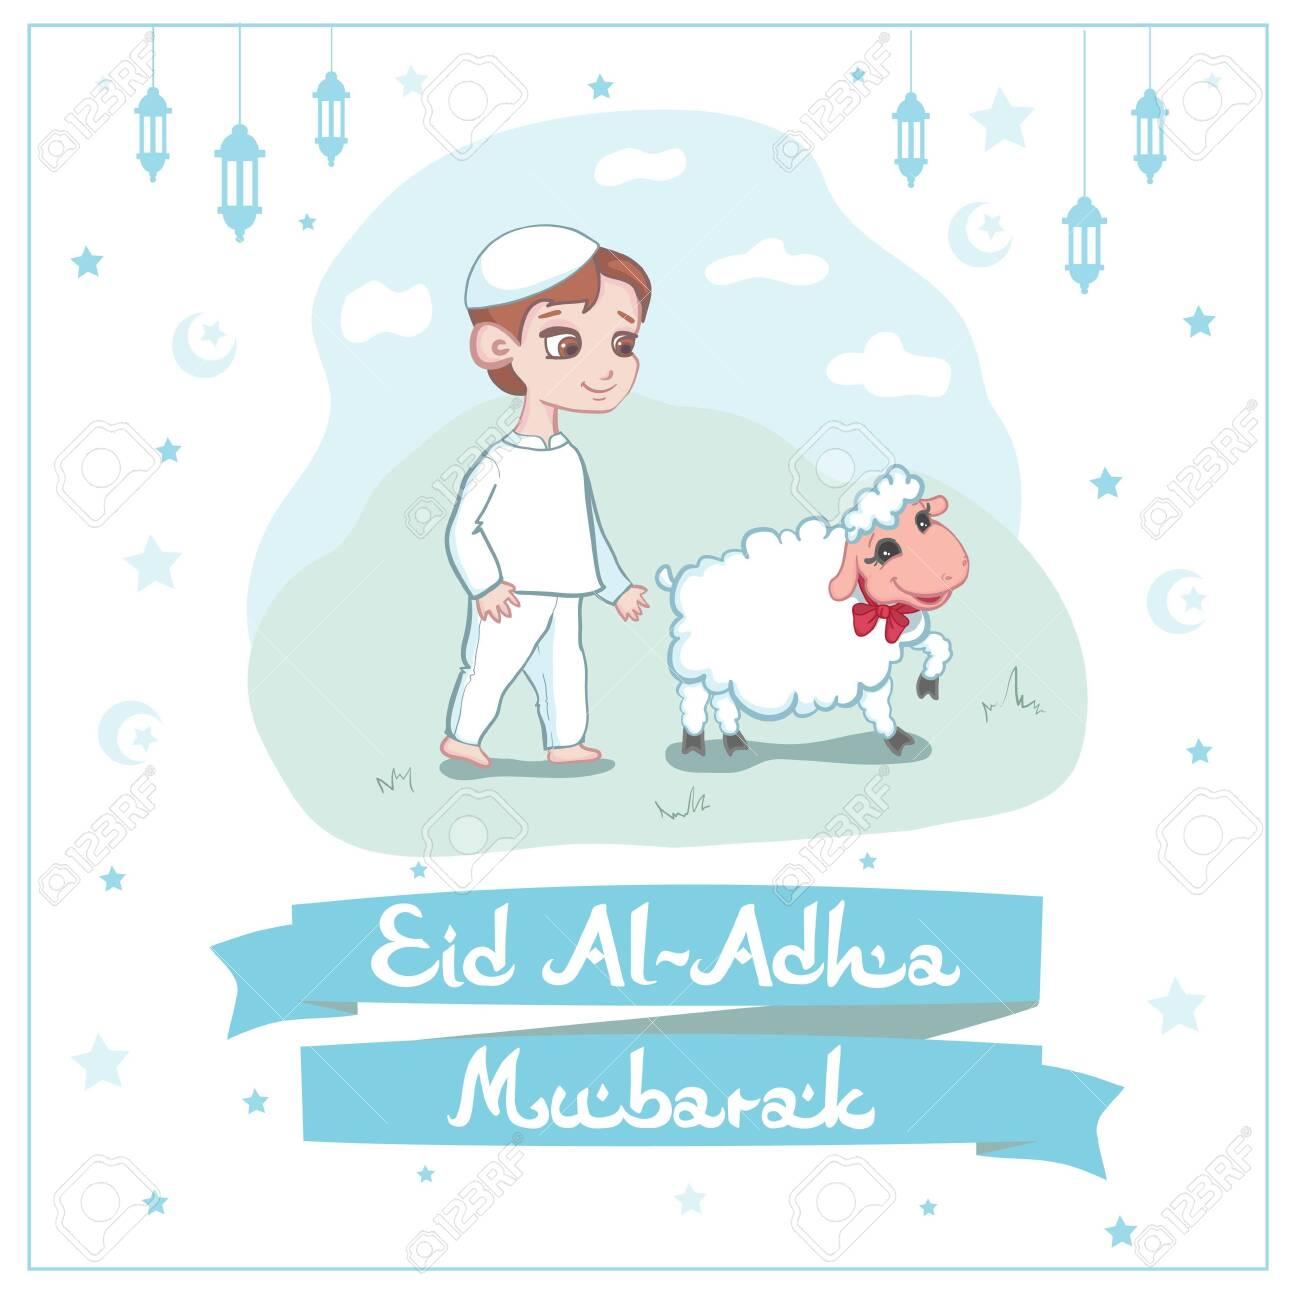 Card or poster design for Eid Al-Adha Mubarak festival to celebrate the willingness - 128521394